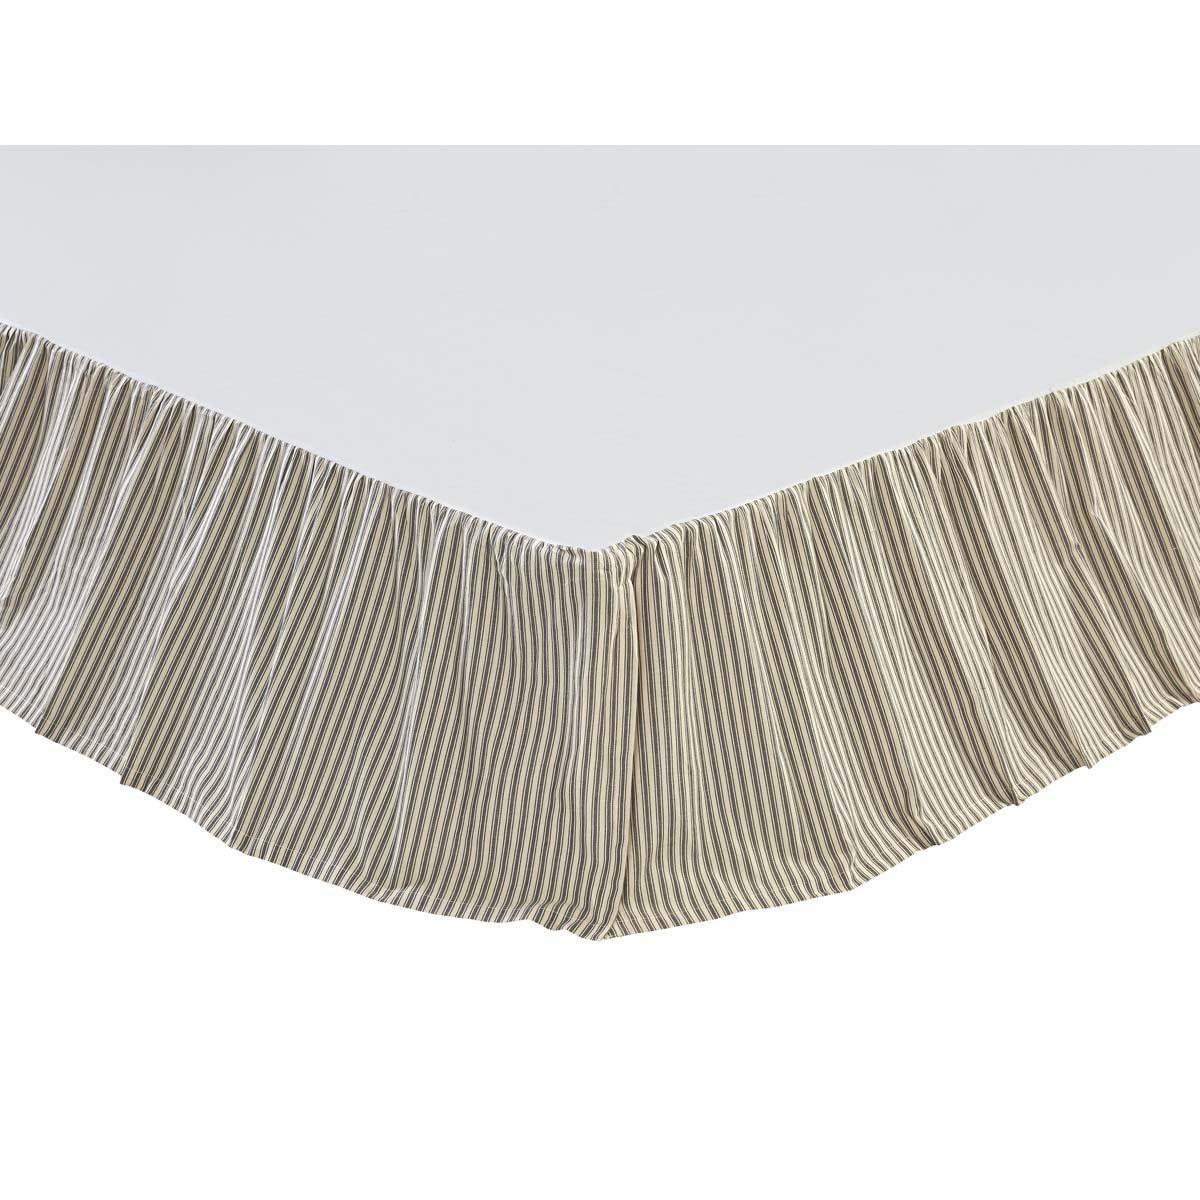 VHC Brands Farmhouse Kendra Stripe White Bed Skirt, Queen, Black